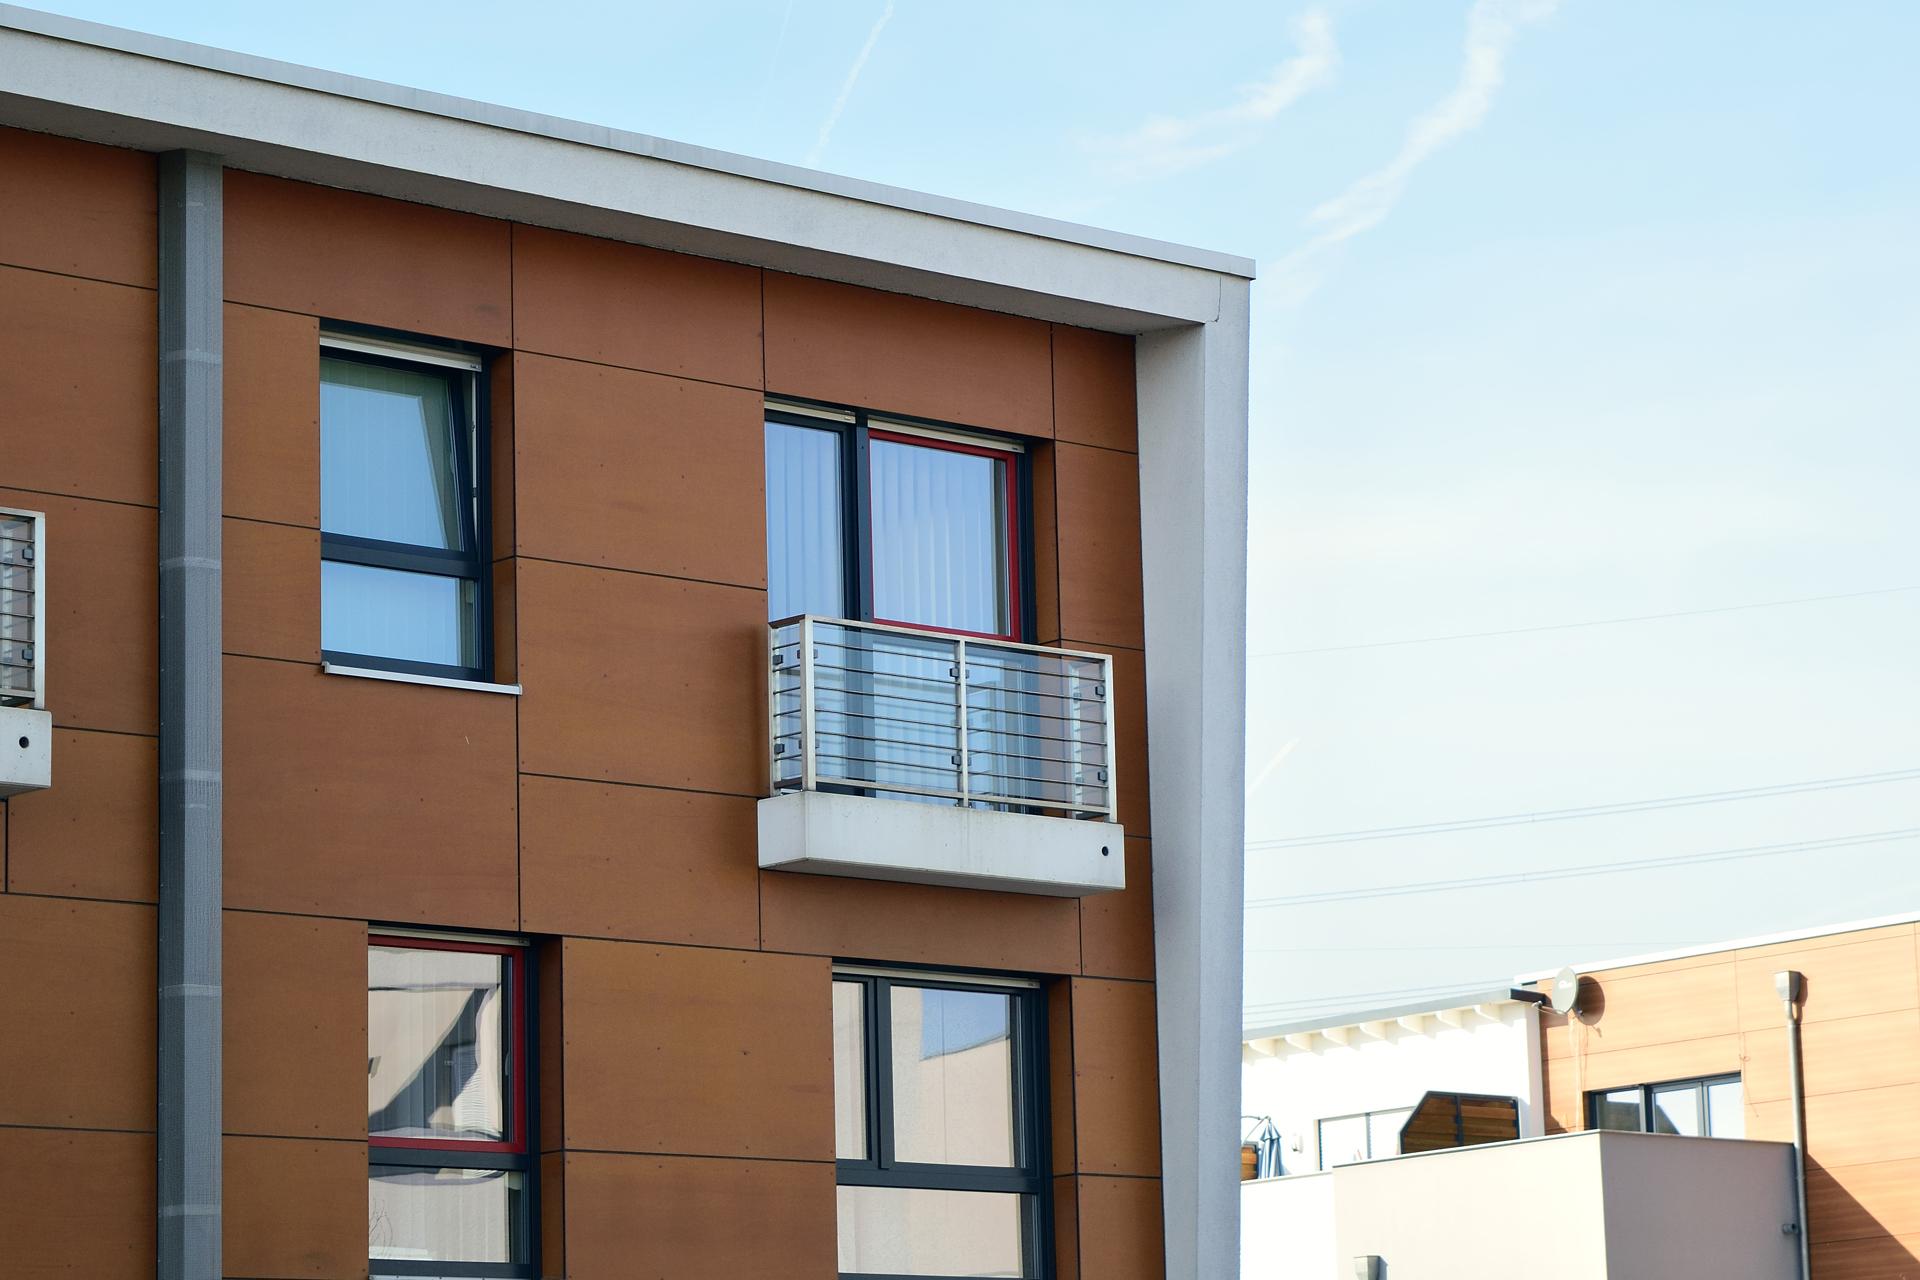 ALUK 58bw Windows, Watford